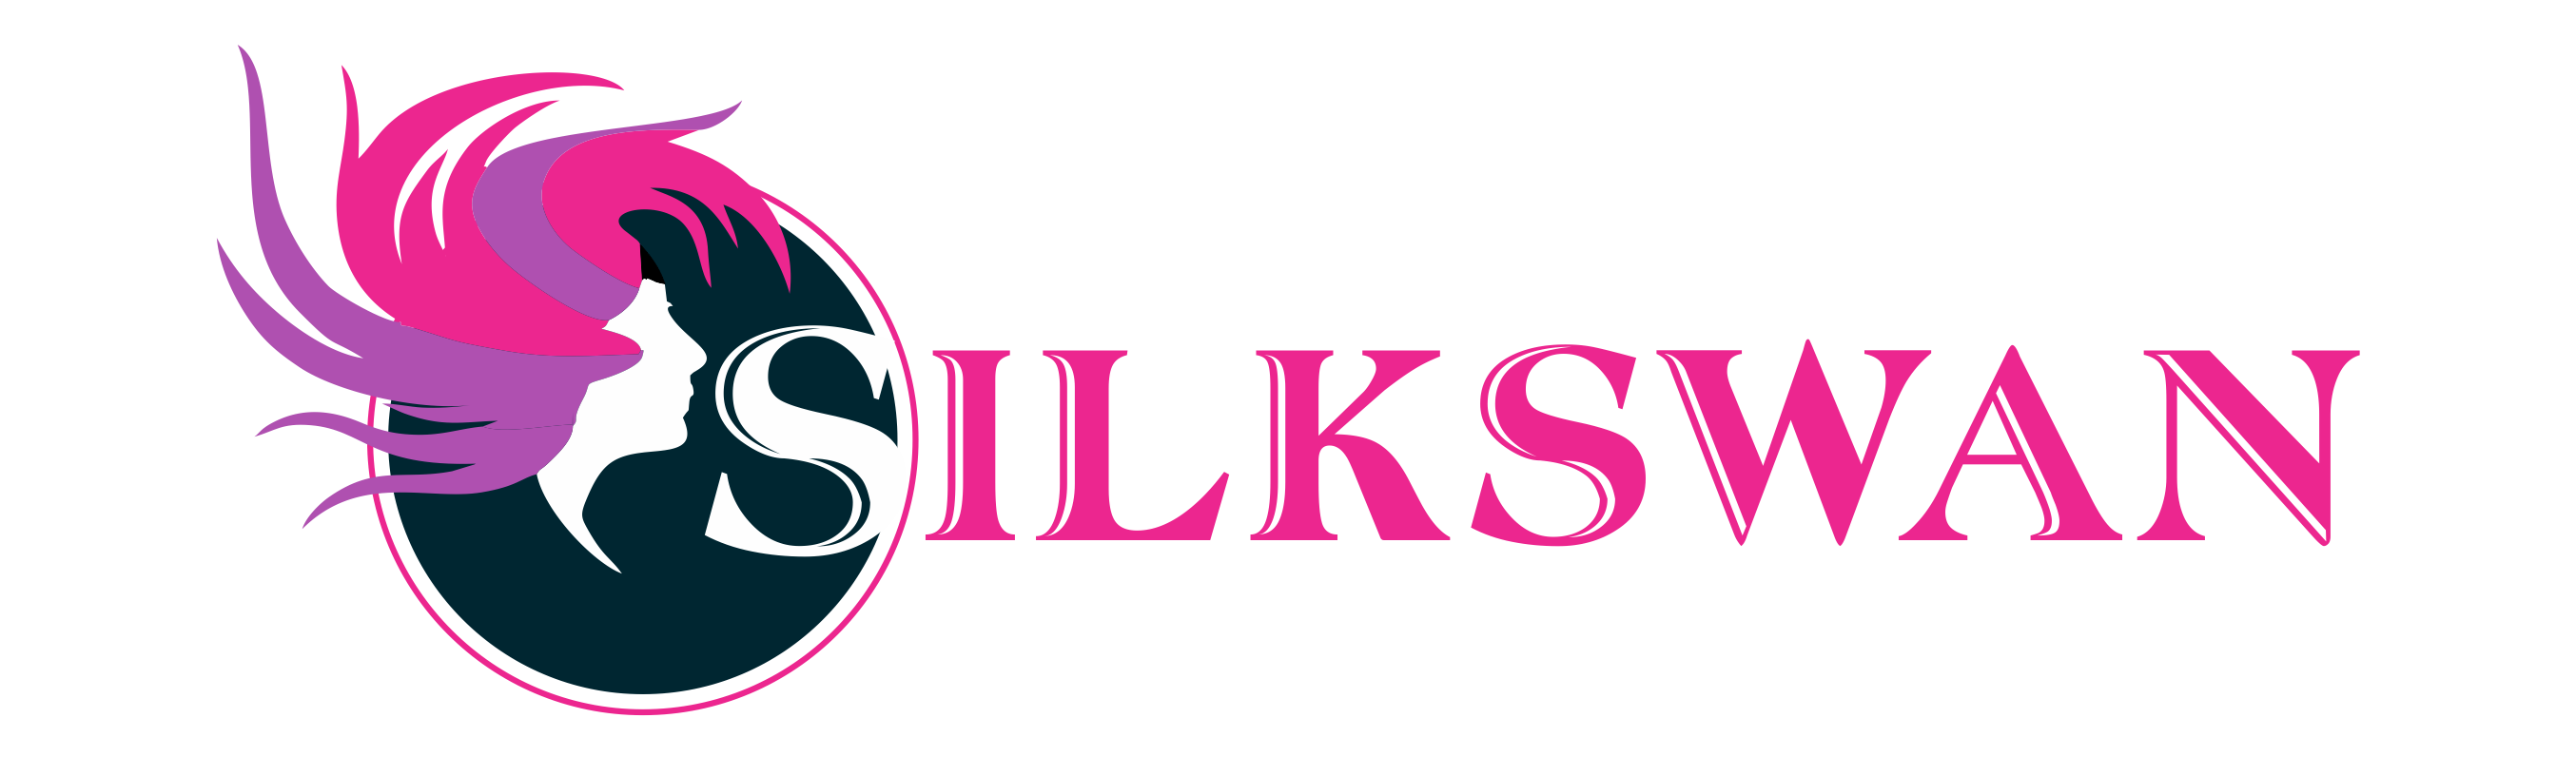 silkswanhair